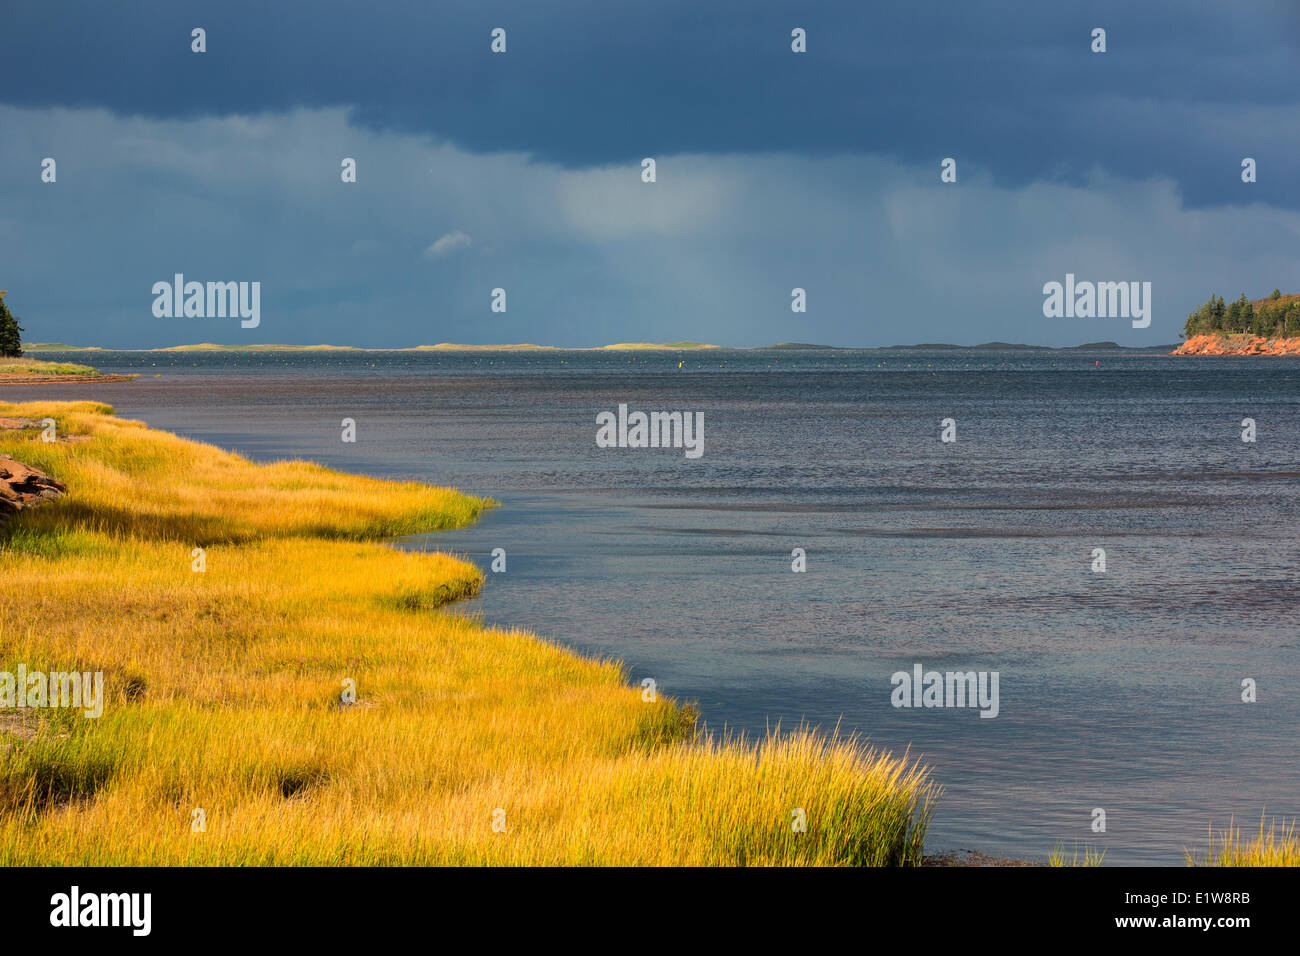 New London Bay, Prince Edward Island, Canada - Stock Image